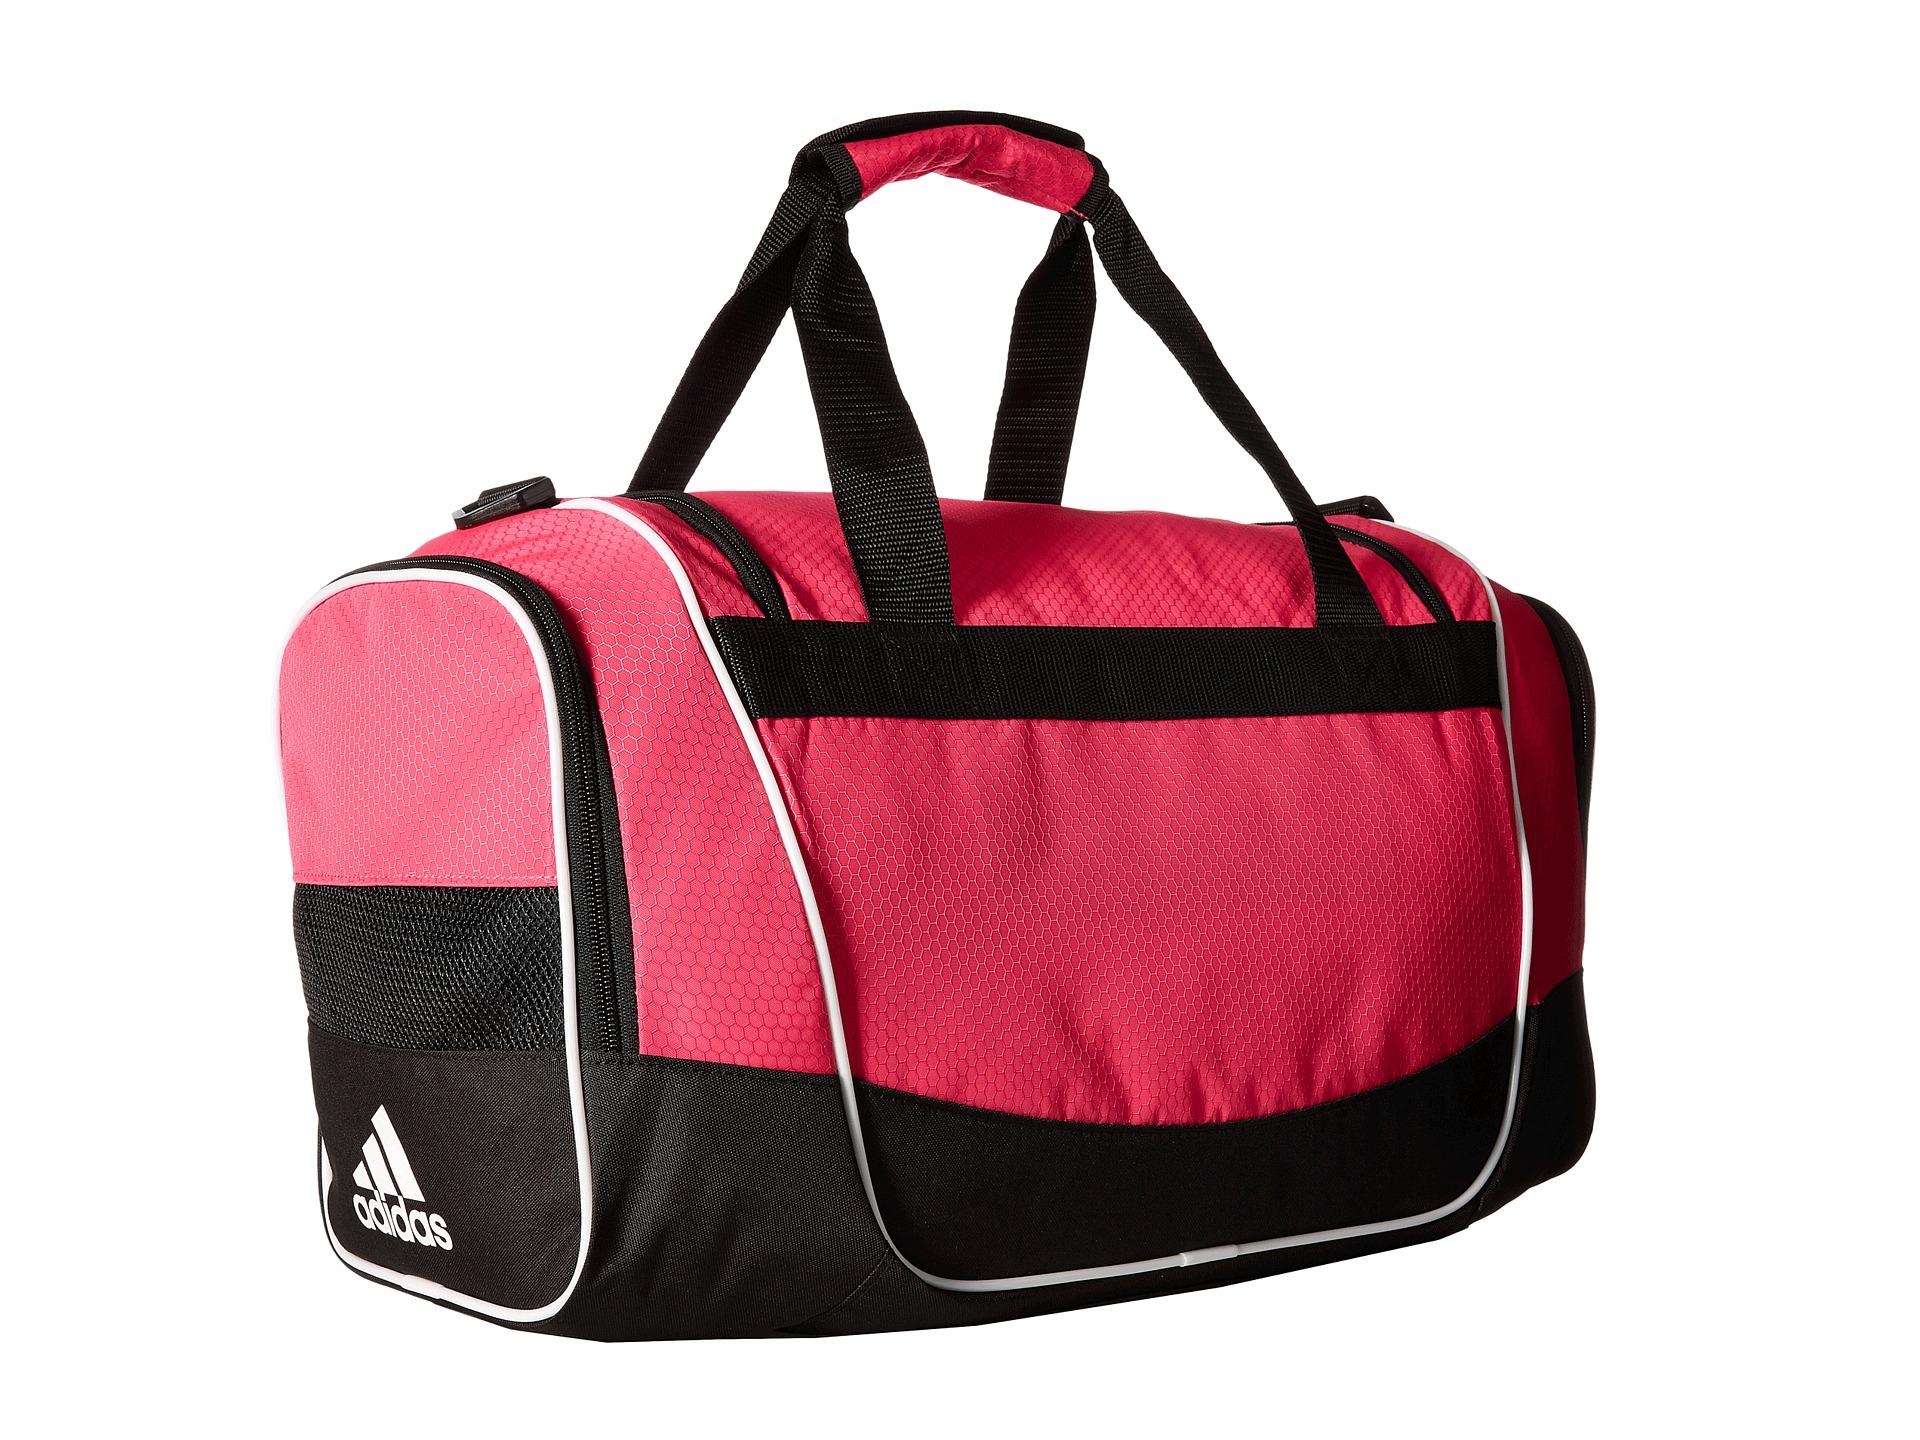 4477b87c7b adidas small duffel bag cheap   OFF46% The Largest Catalog Discounts